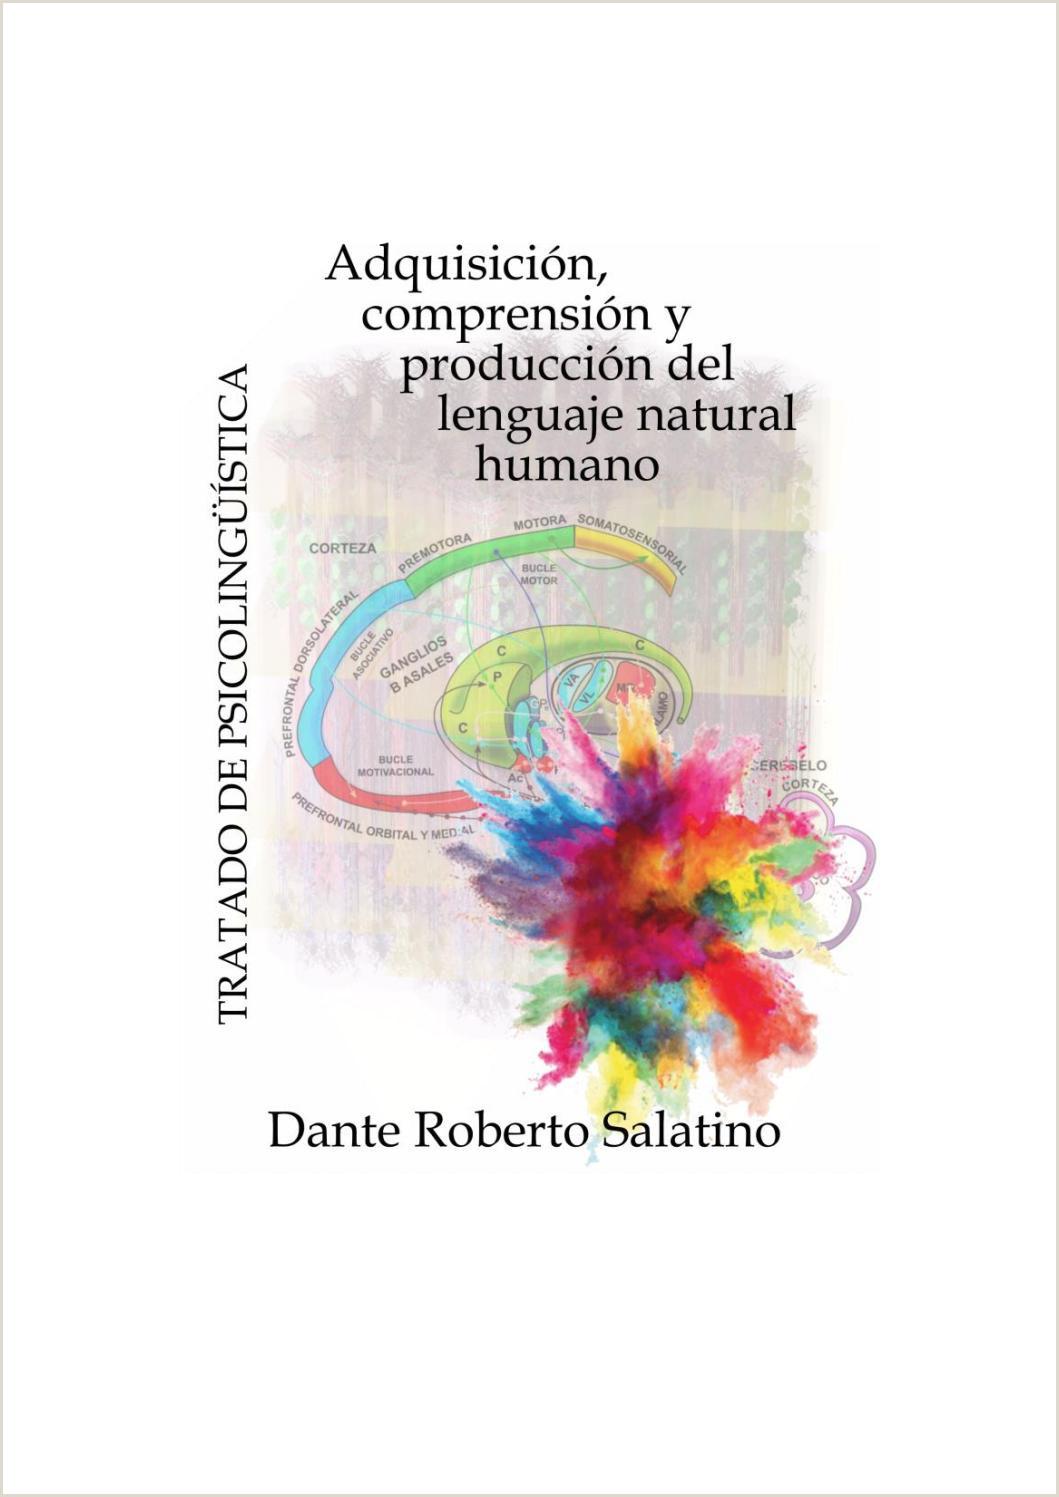 Formato Unico De Hoja De Vida Funcion Publica Modificable Tratado De Psicolingüstica by Dante Salatino issuu